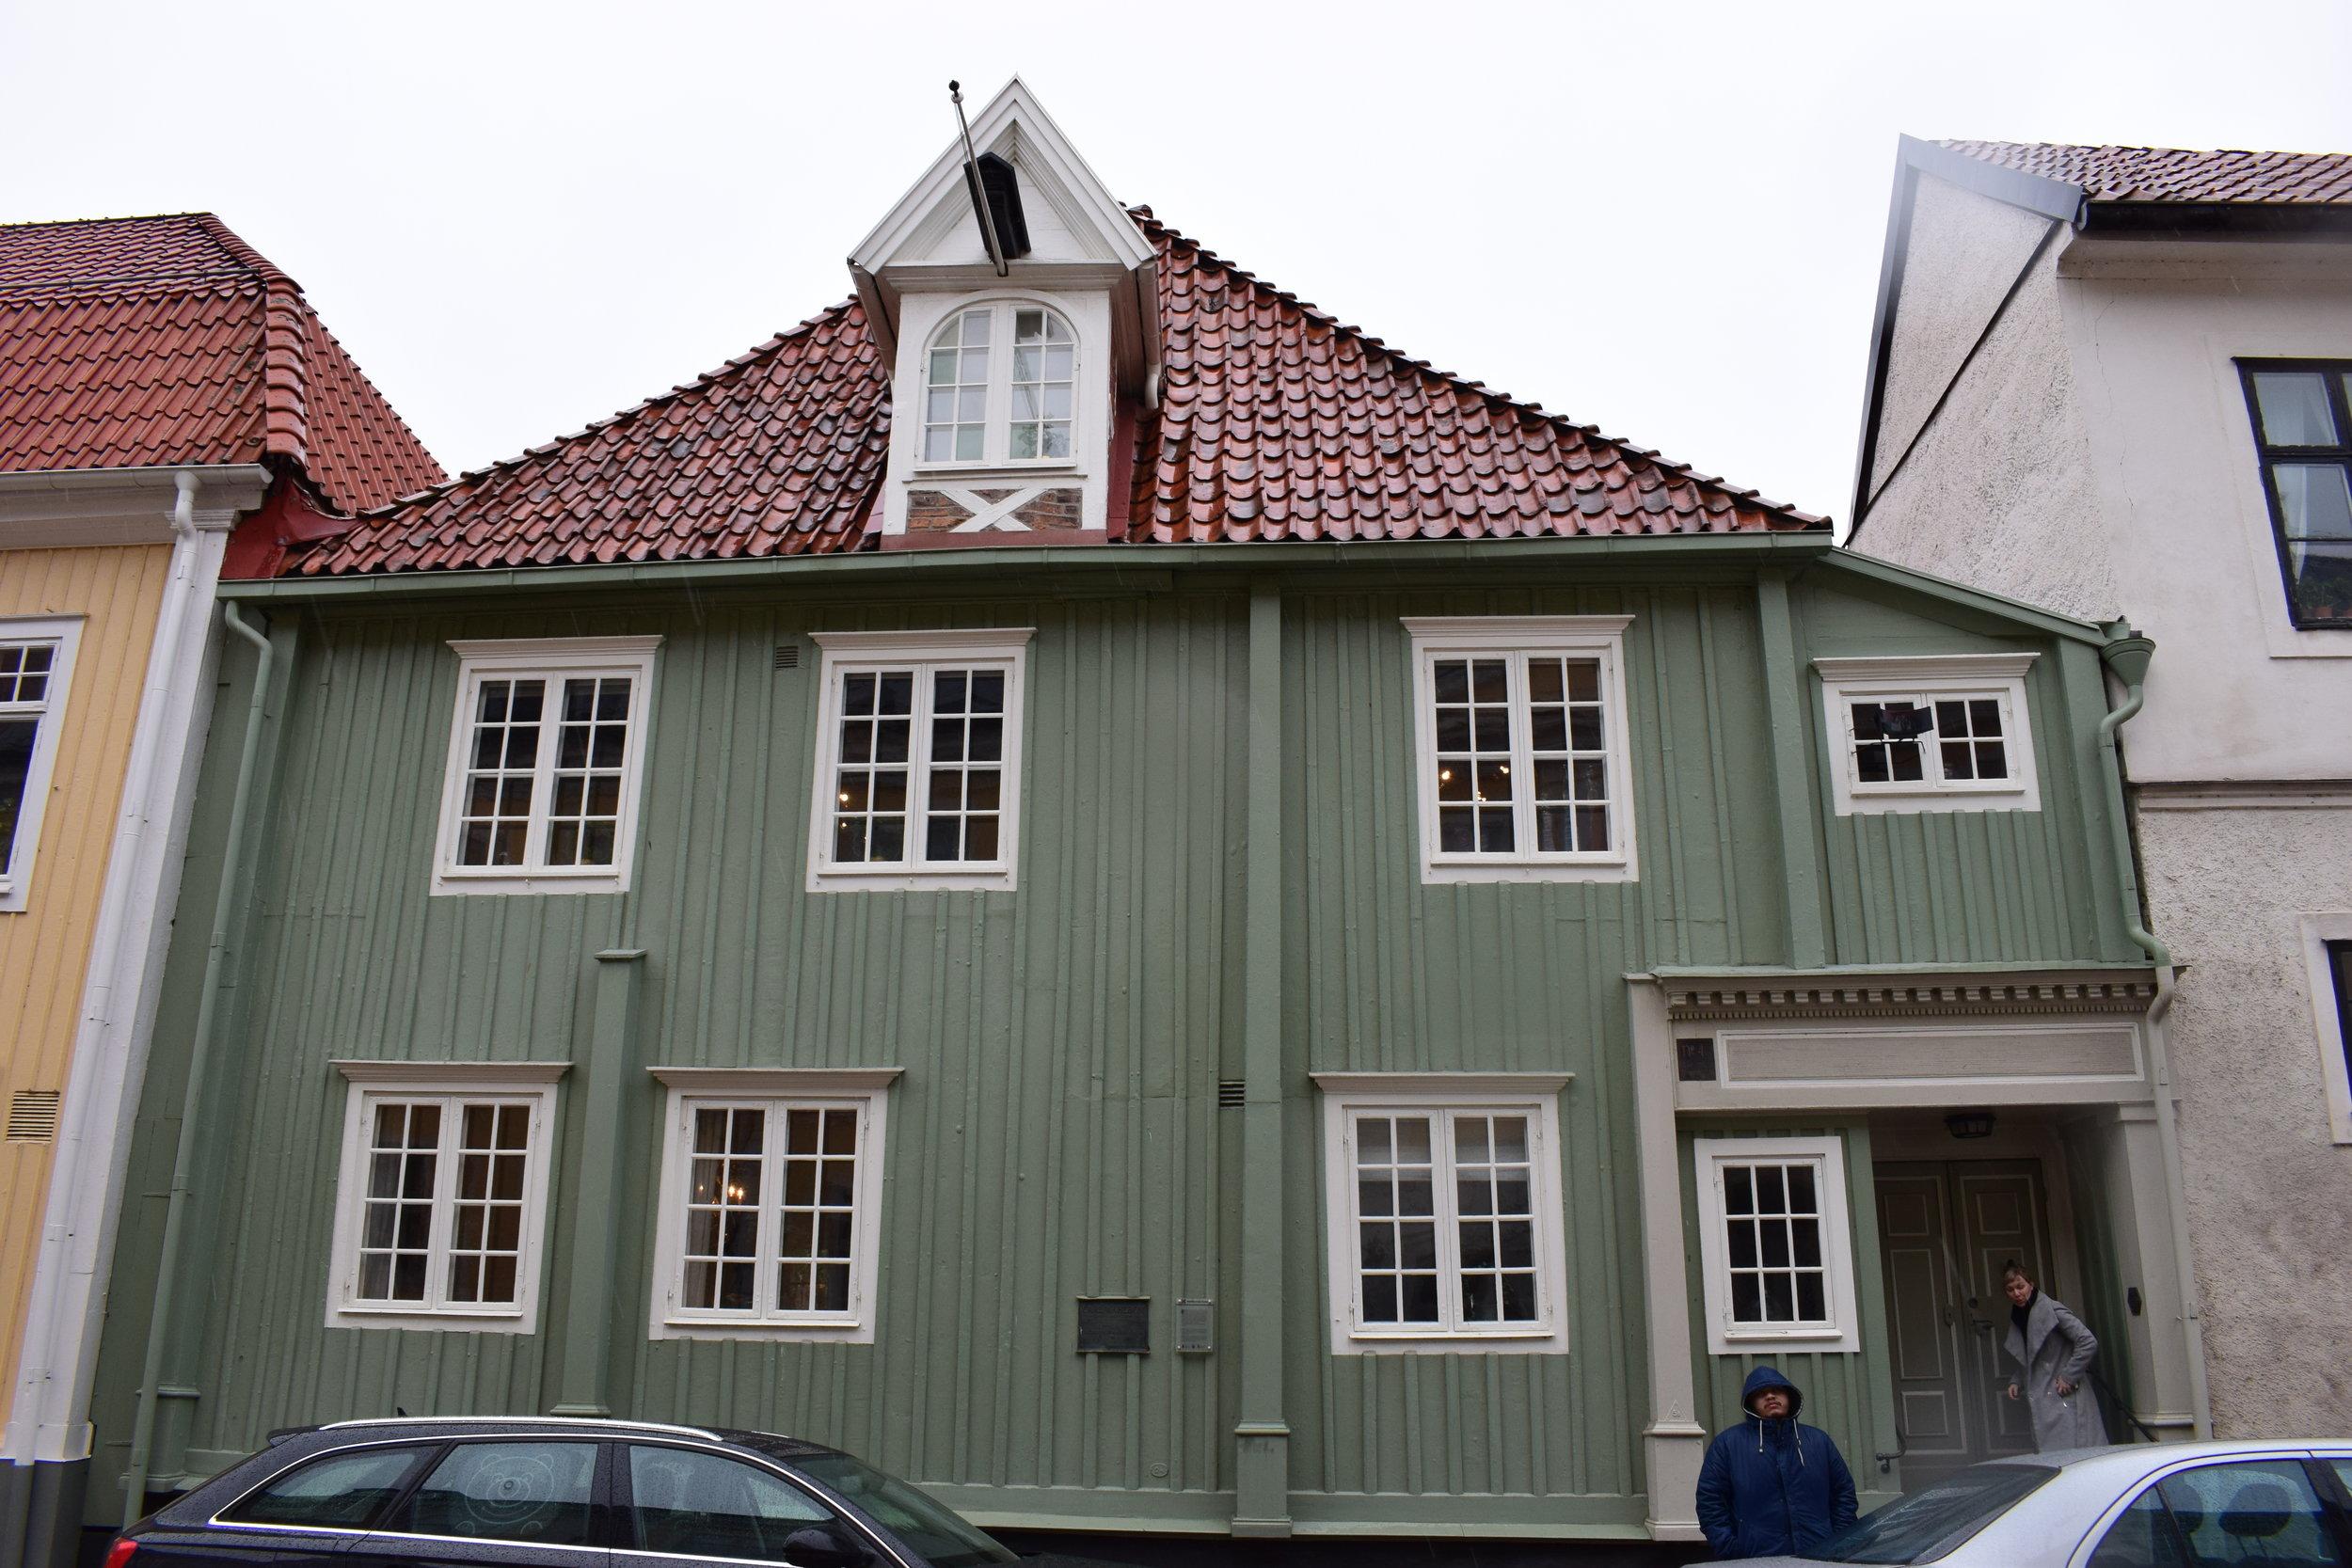 Kalmar, Carl Wahlbom's house